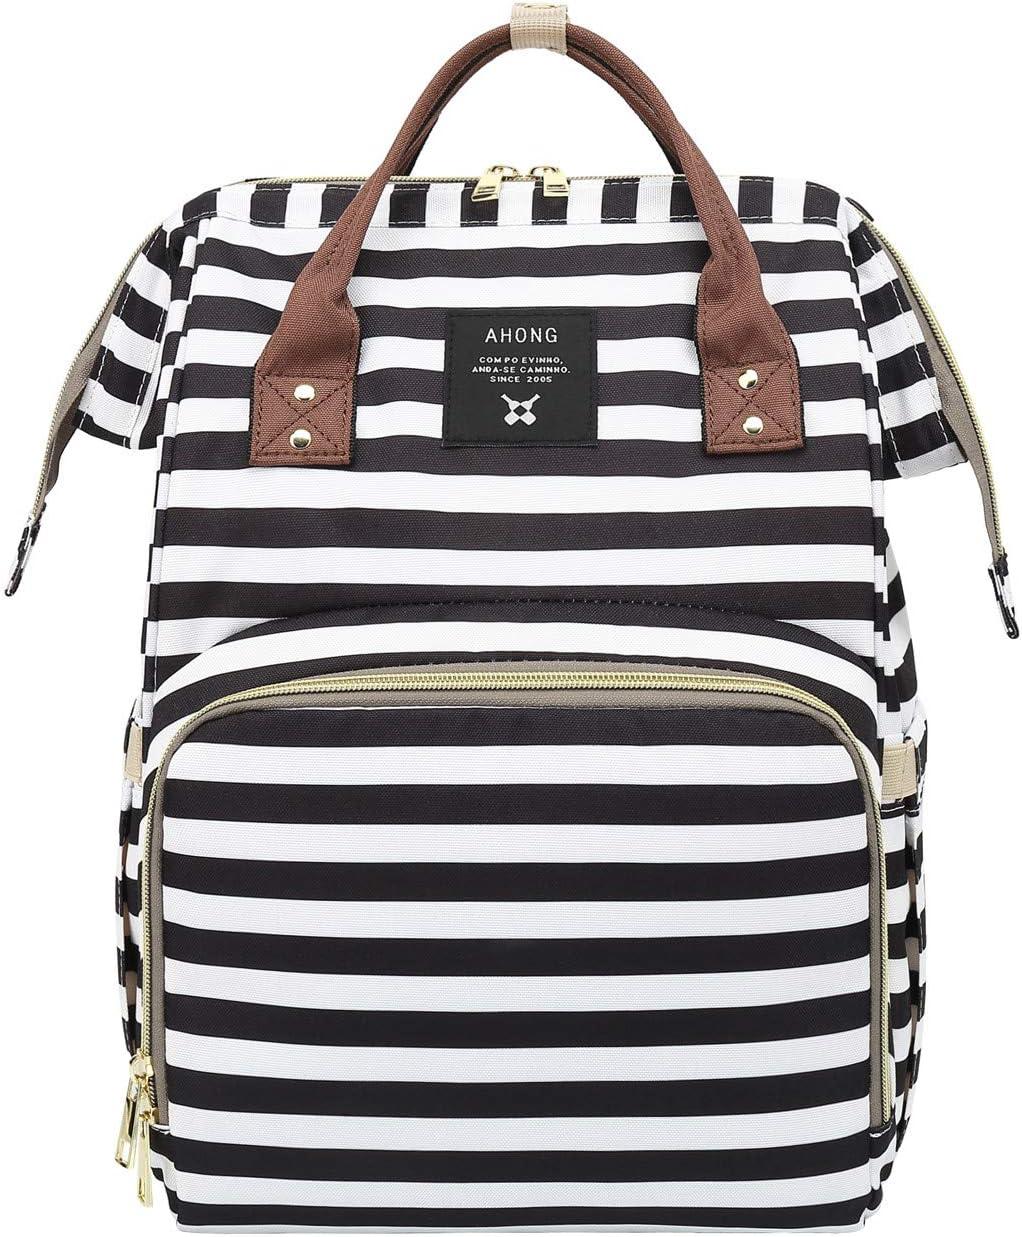 Stripe printing nappy Bags Multi-Function Diaper Bag for Baby Care Handbags Travel Backpack Black/white